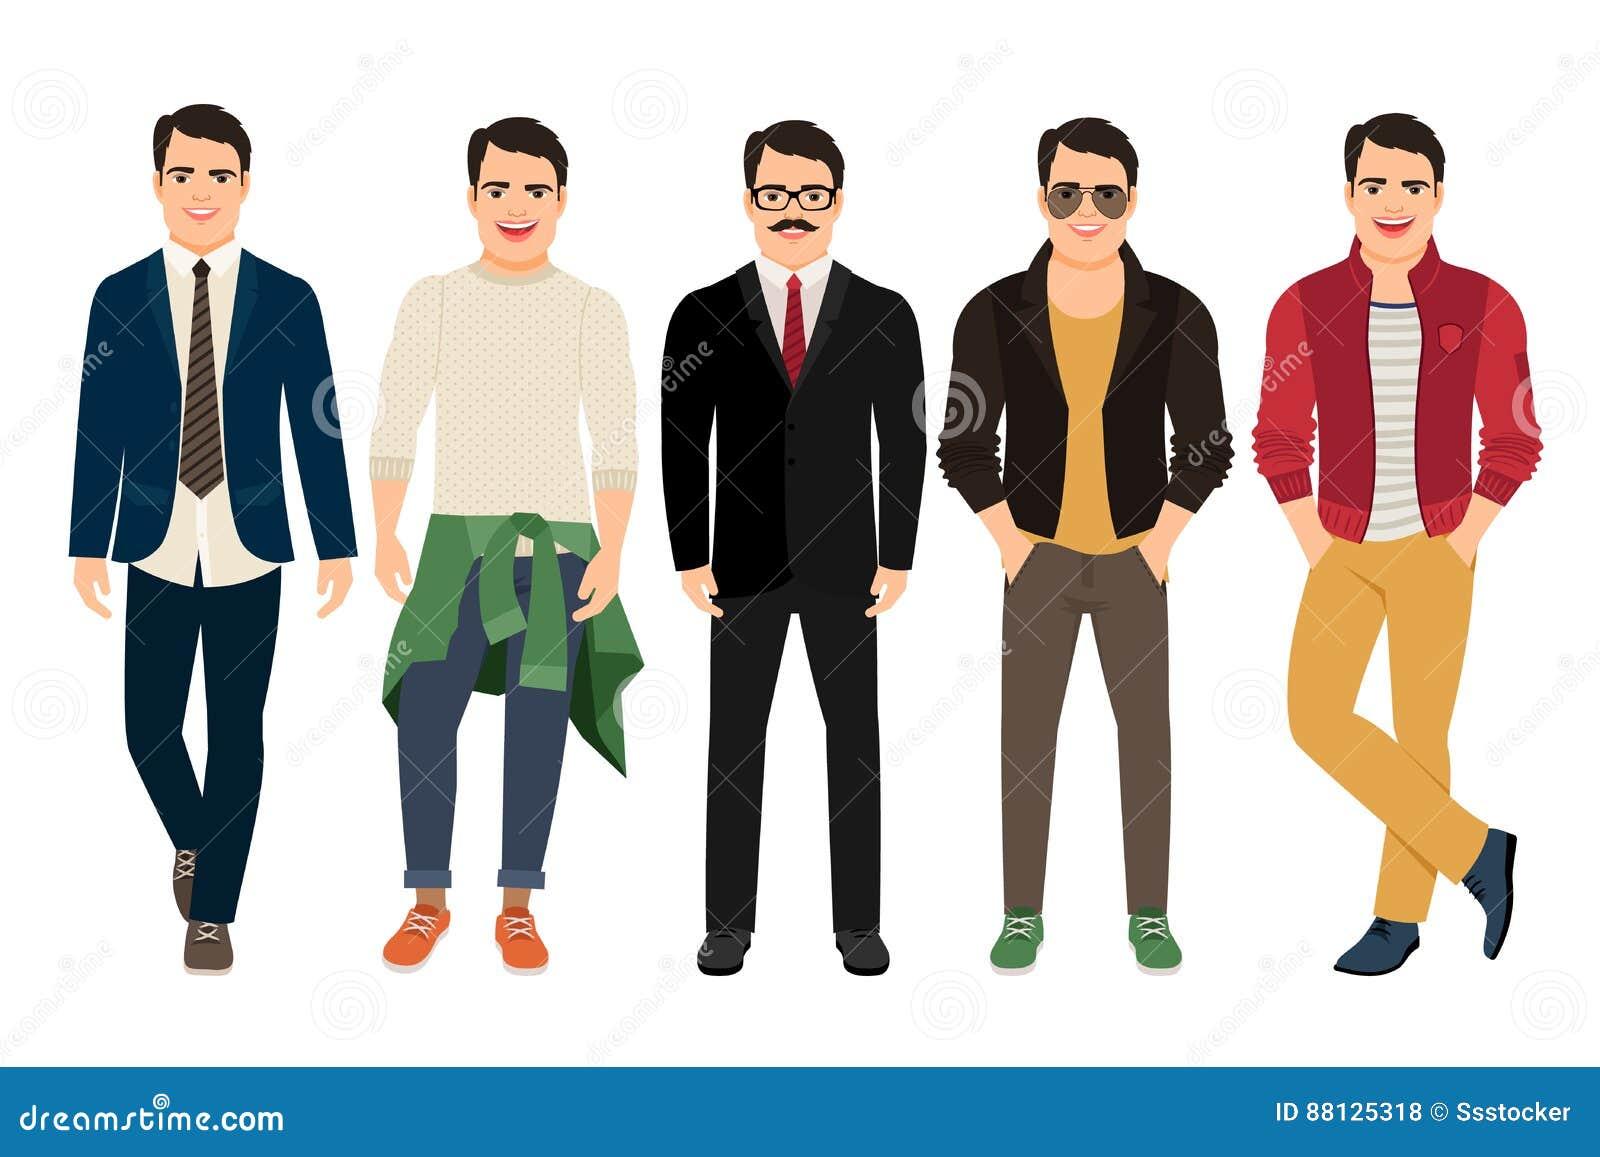 deeee70bc118d Hombres Jovenes En Diversa Ropa Masculina Ilustración del Vector ...